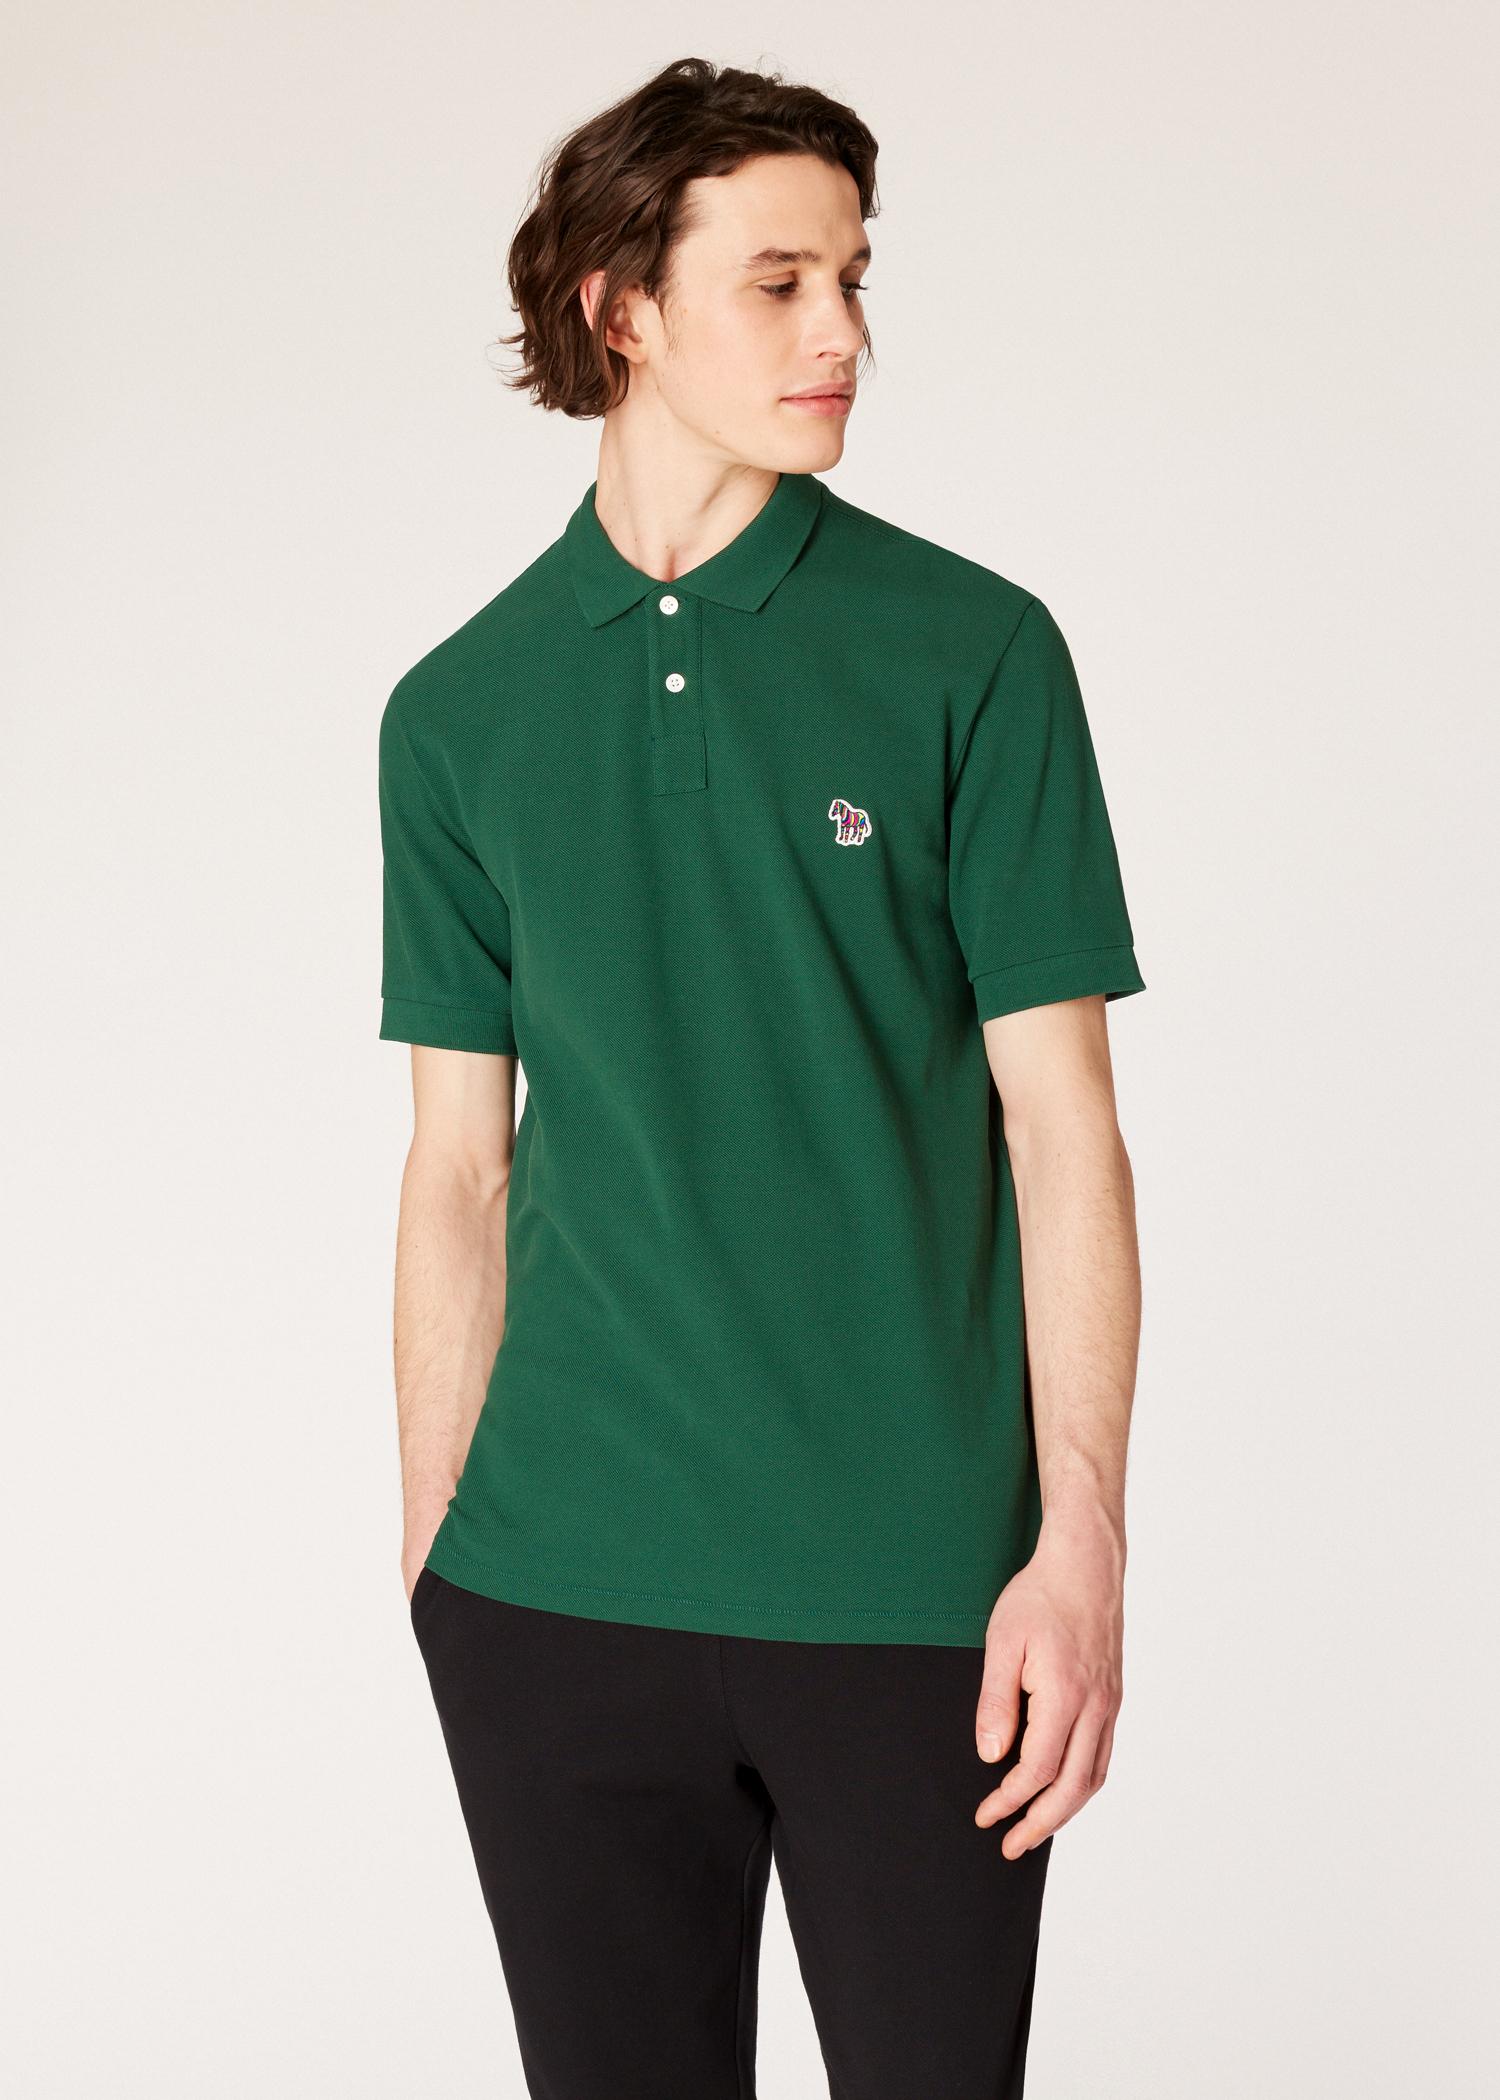 8bf3febf Model front close up- Men's Green Organic Cotton-Piqué Zebra Logo Polo  Shirt Paul